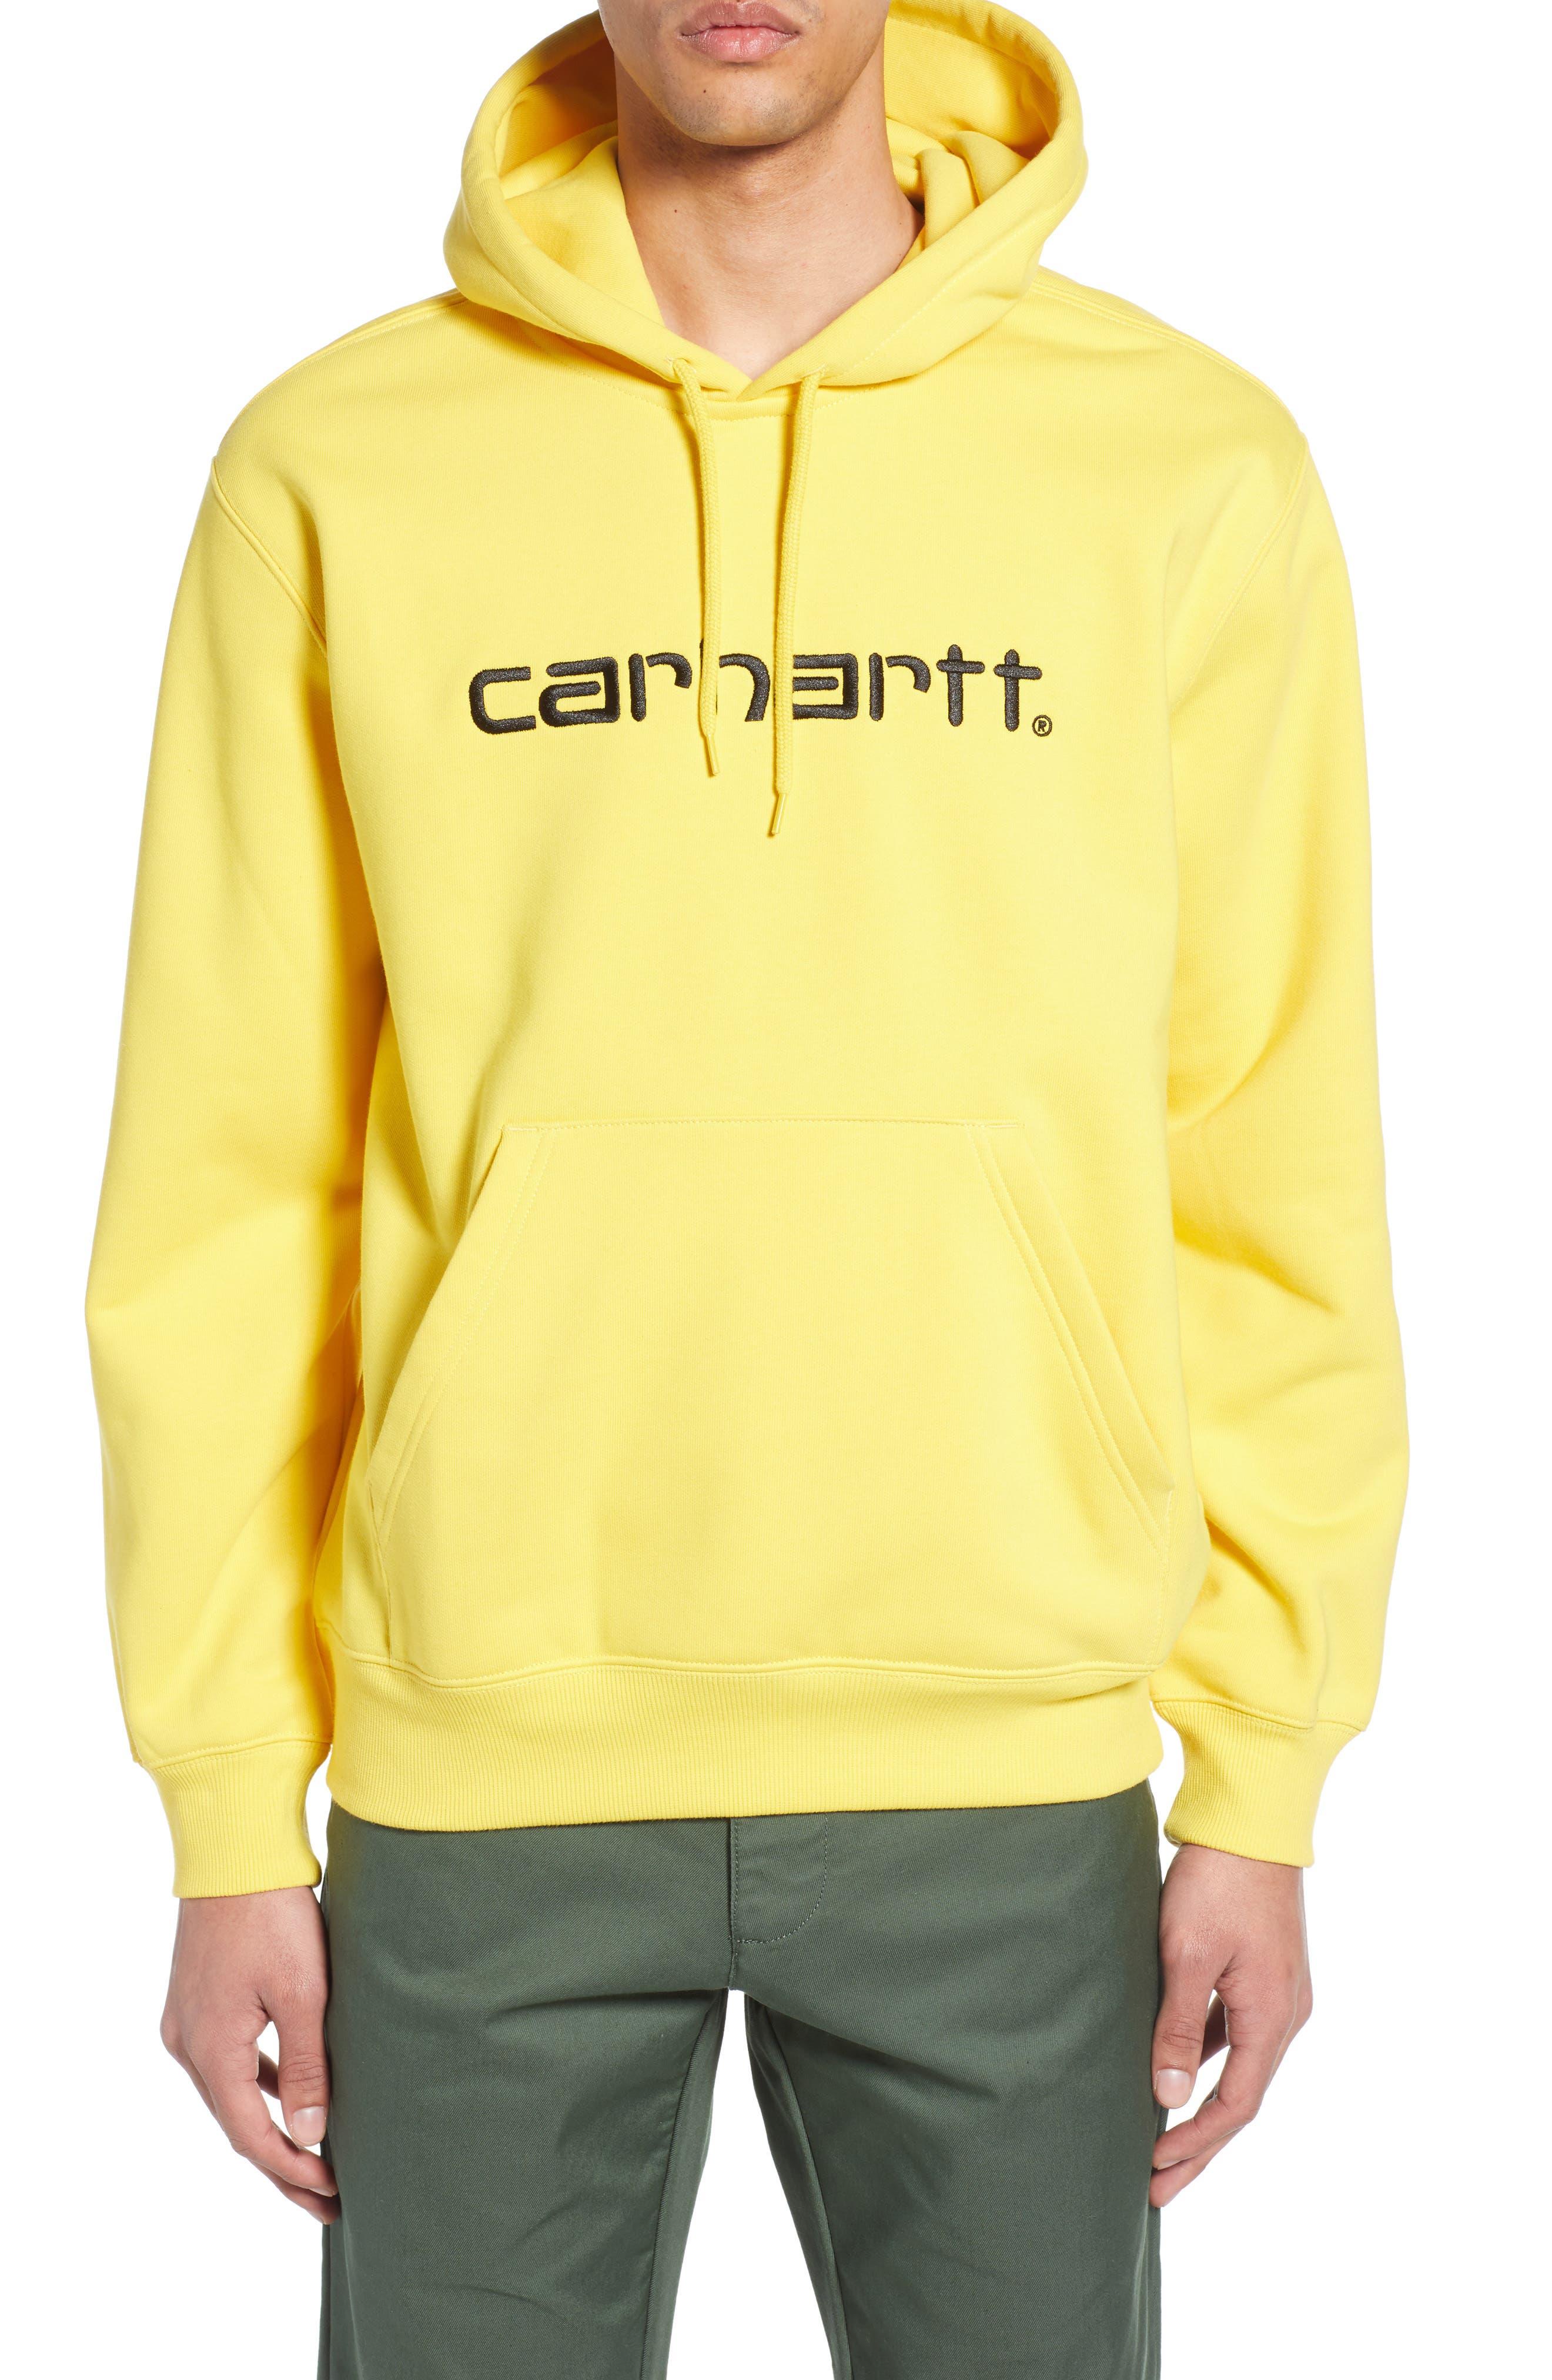 CARHARTT WORK IN PROGRESS Hooded Sweatshirt, Main, color, PRIMULA / BLACK